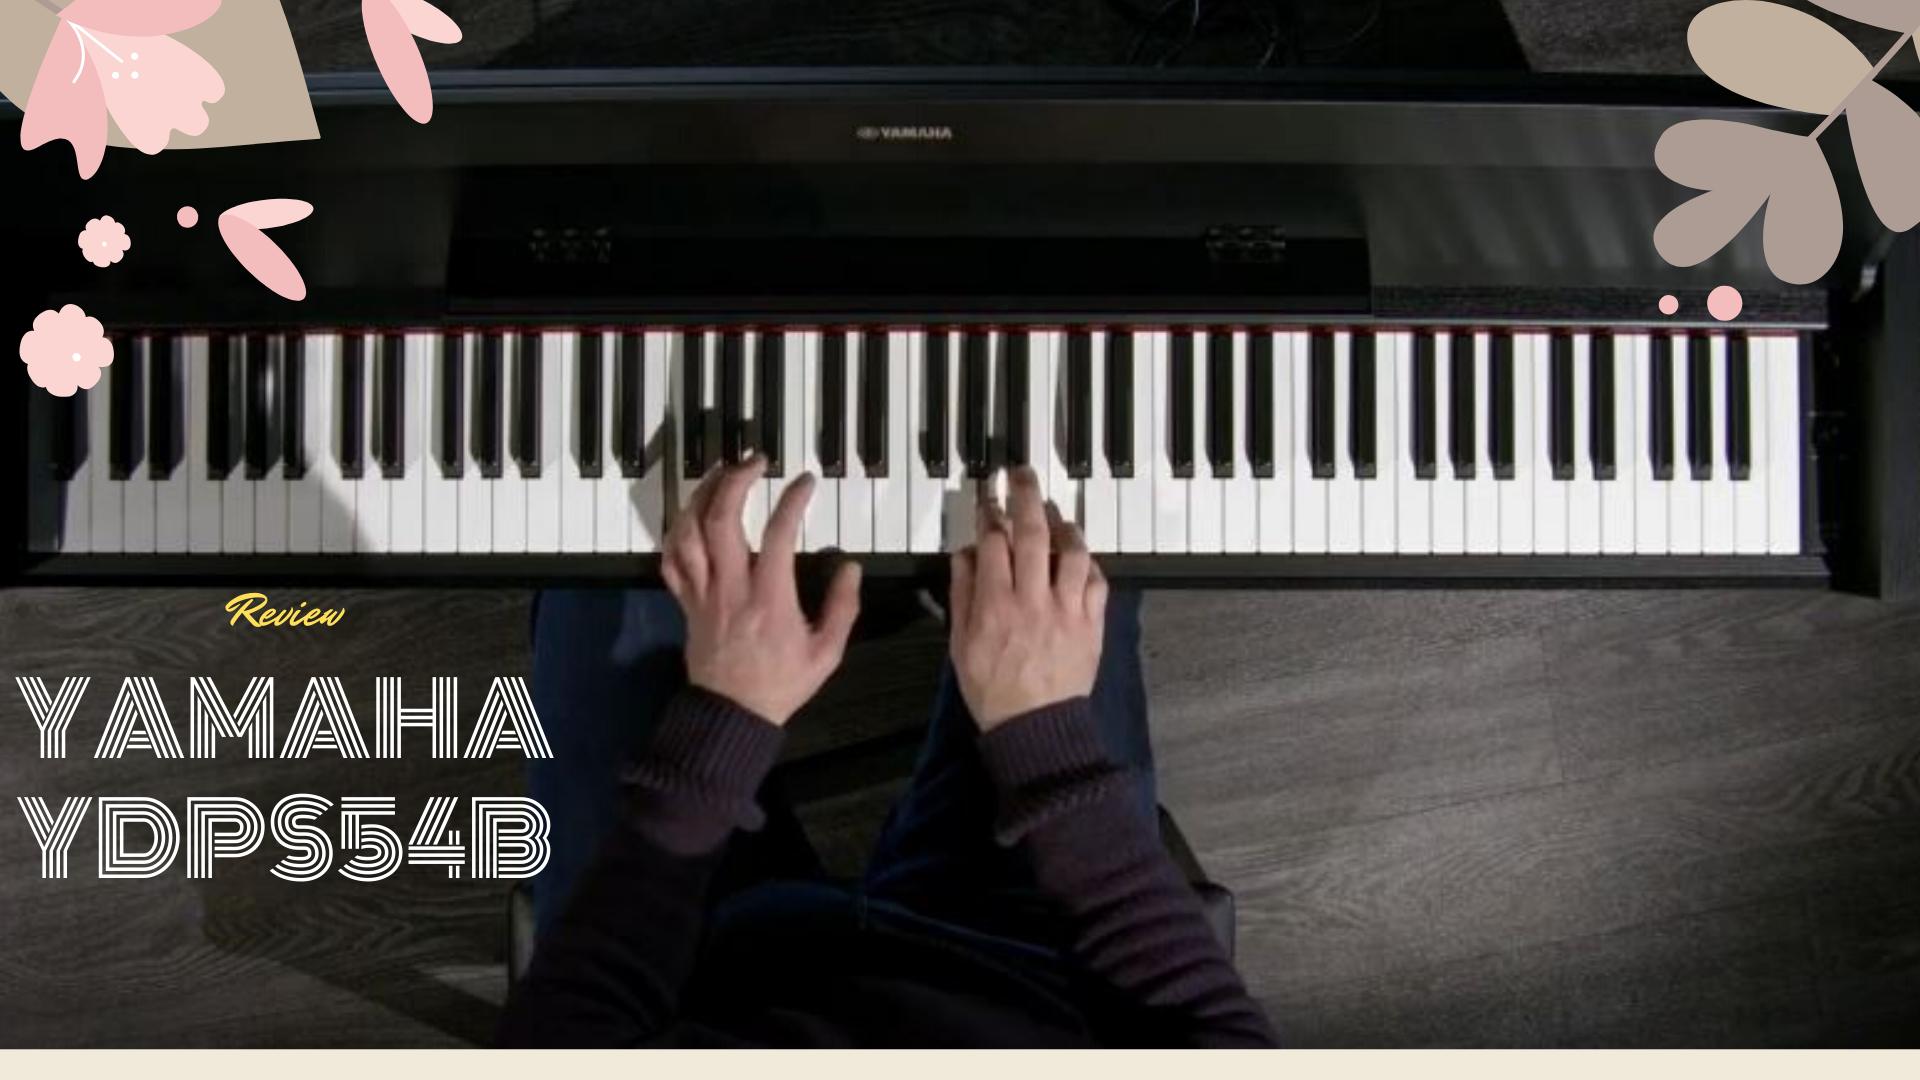 Yamaha YDPS54B Review